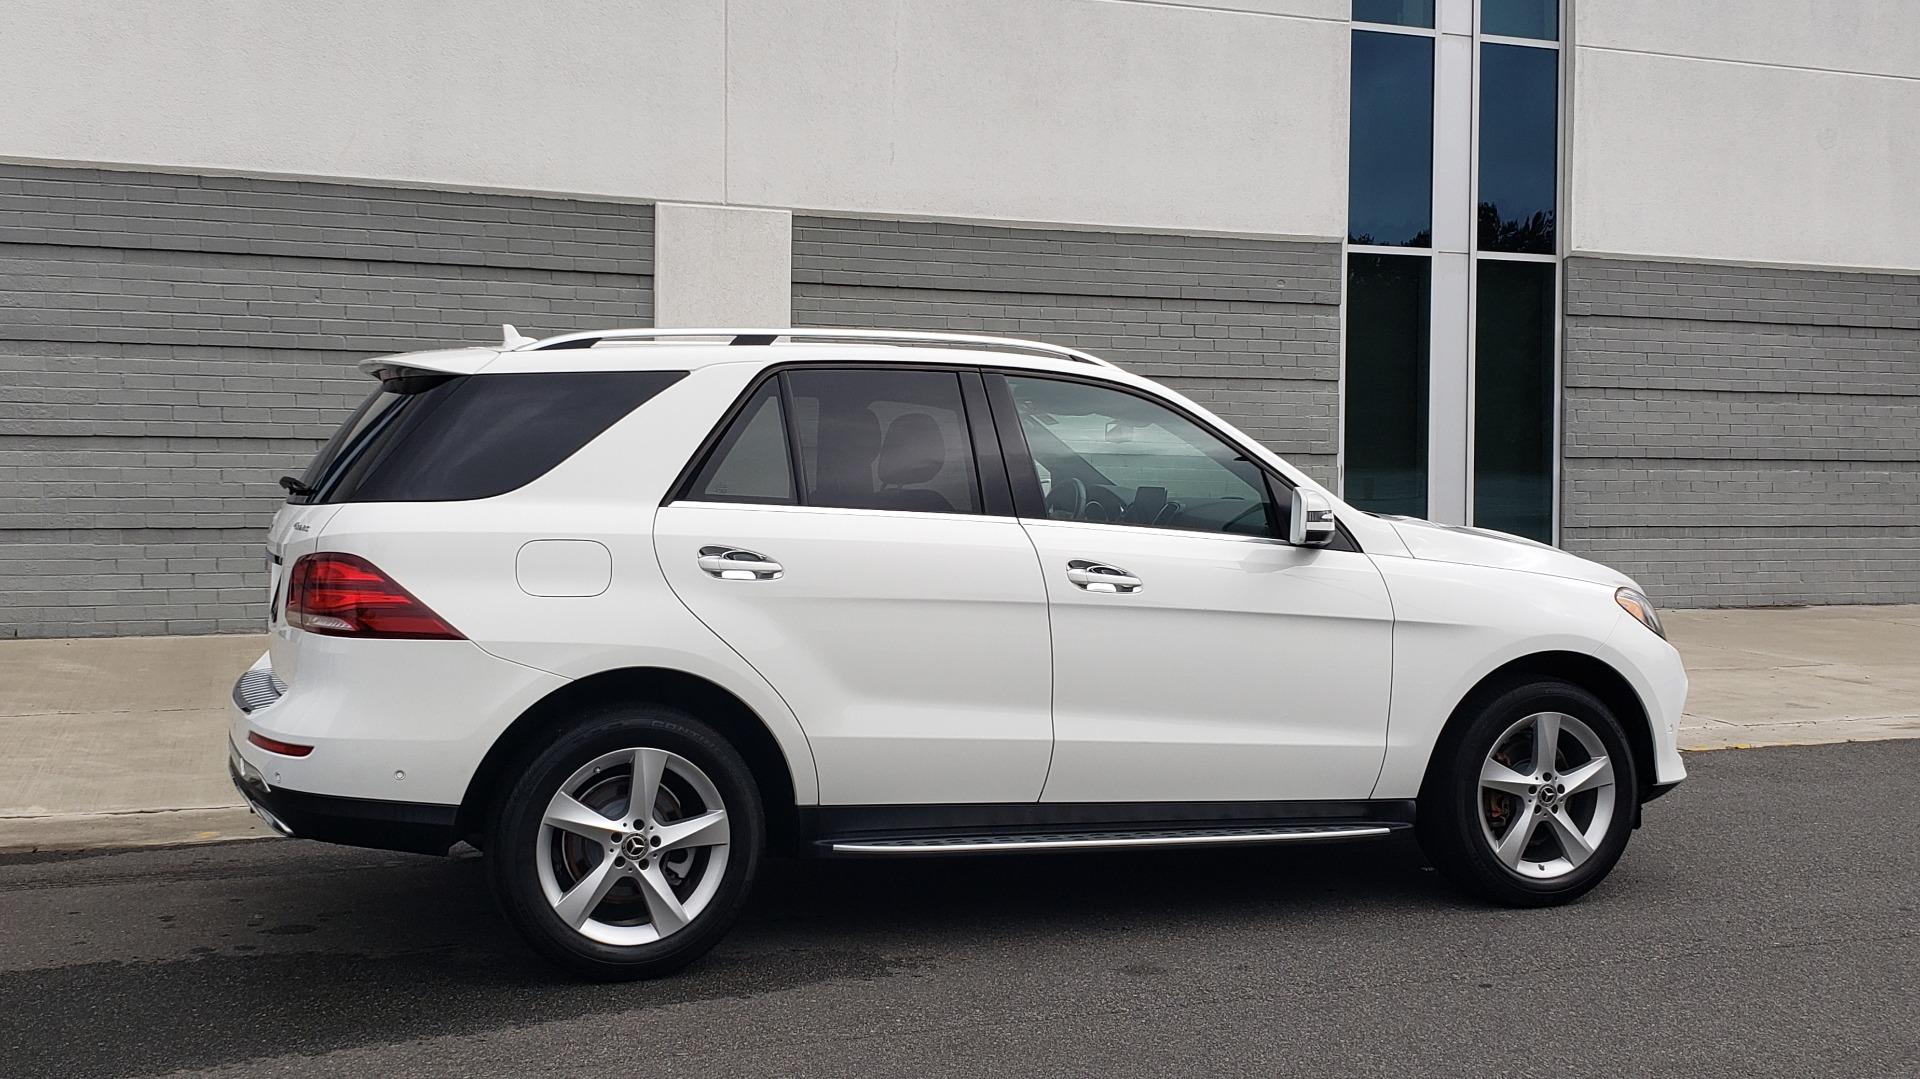 Used 2018 Mercedes-Benz GLE 350 4MATIC / PREM PKG / NAV / PARK ASST / K/H SND / HITCH / REARVIEW for sale $40,801 at Formula Imports in Charlotte NC 28227 8